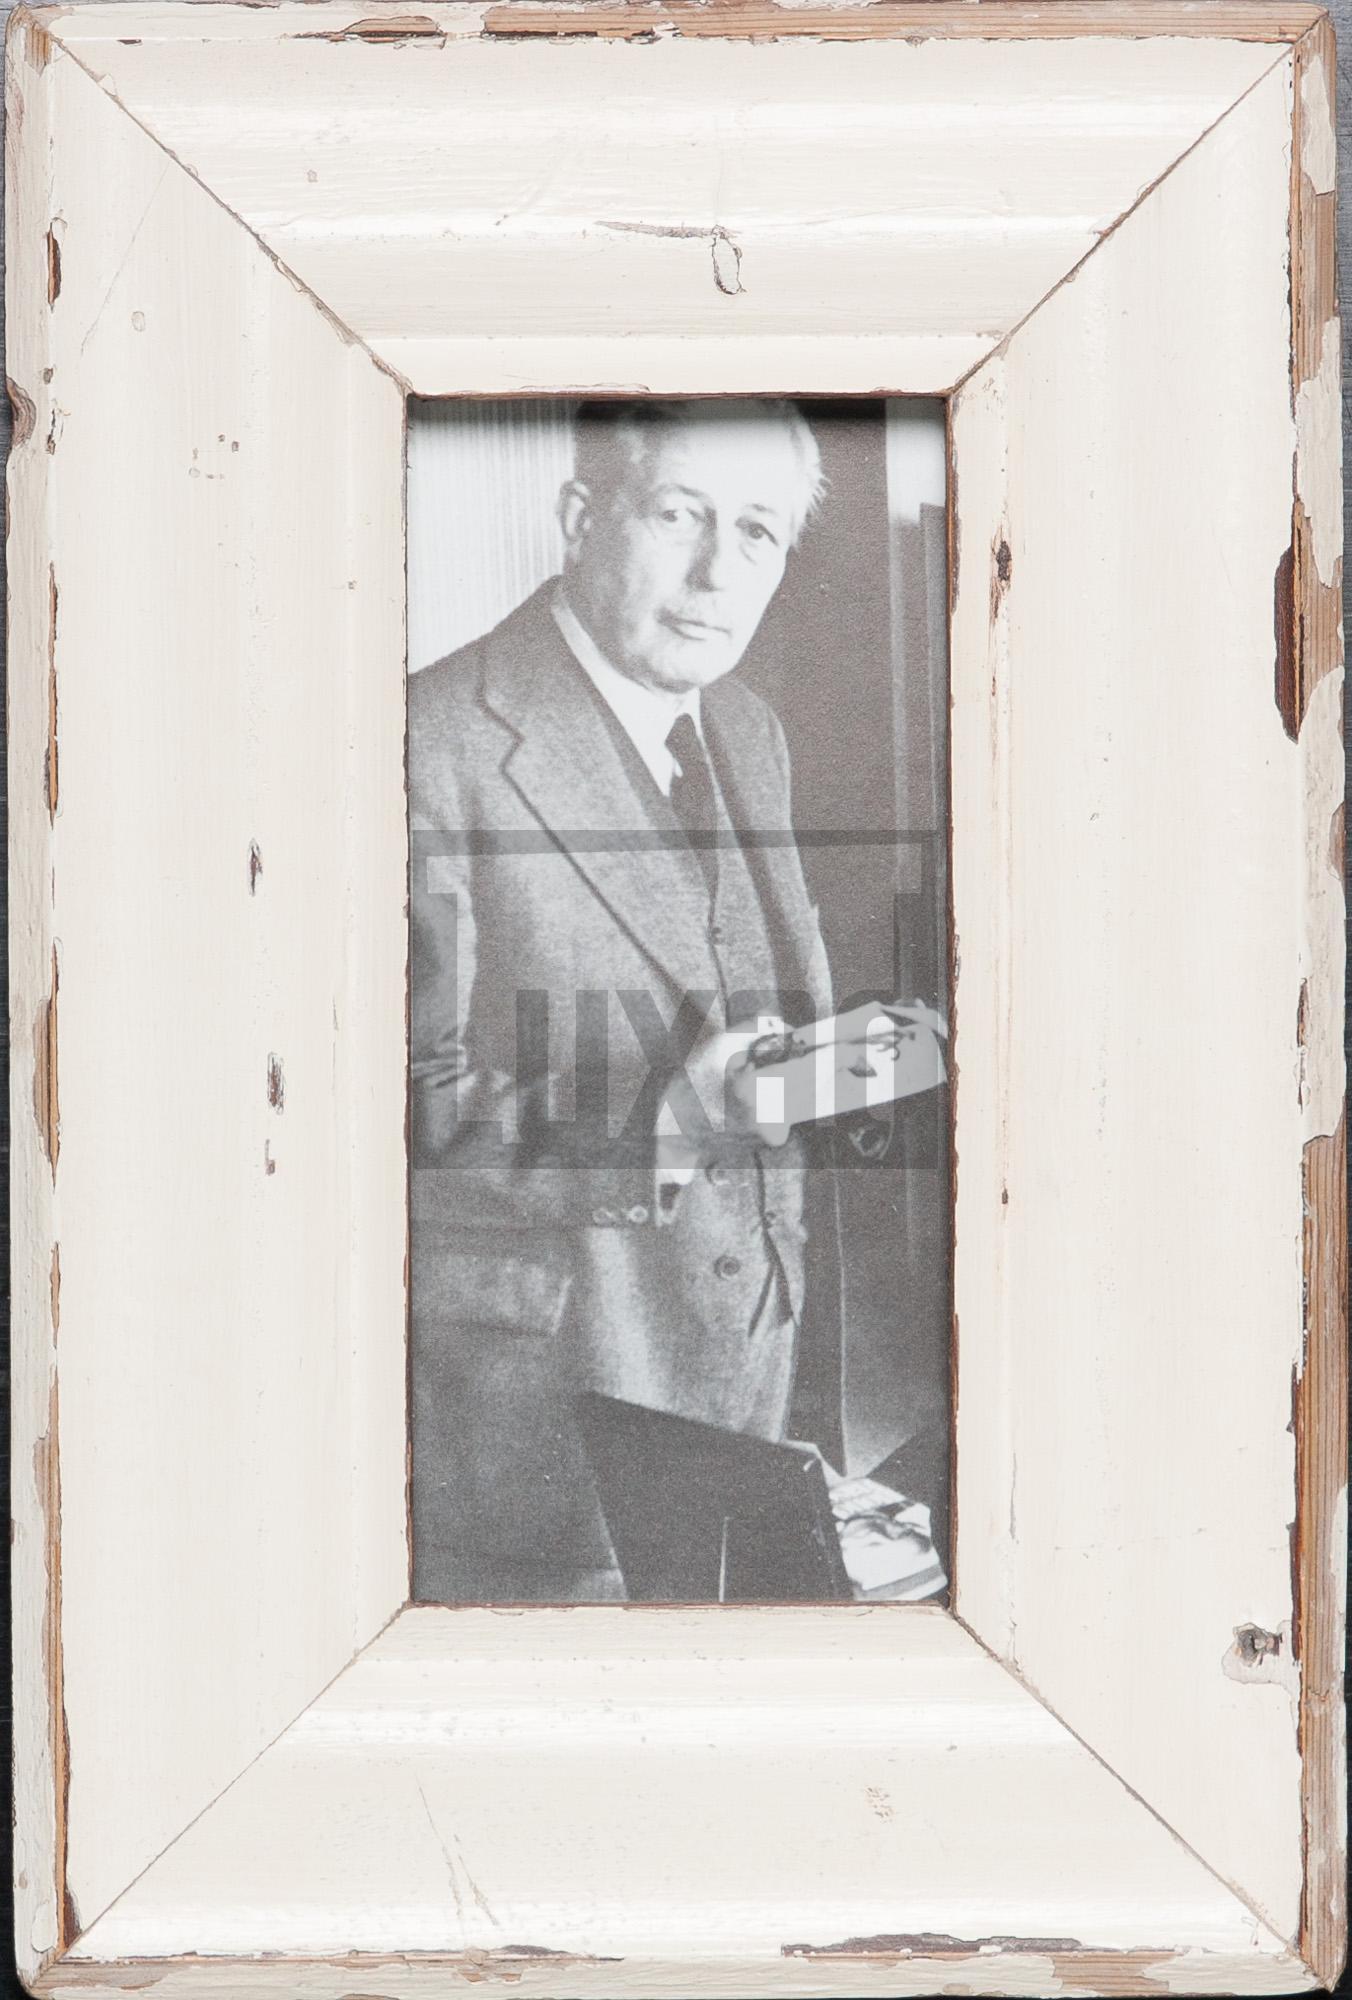 Panorama-Bilderrahmen aus altem Holz für Panoramafotos